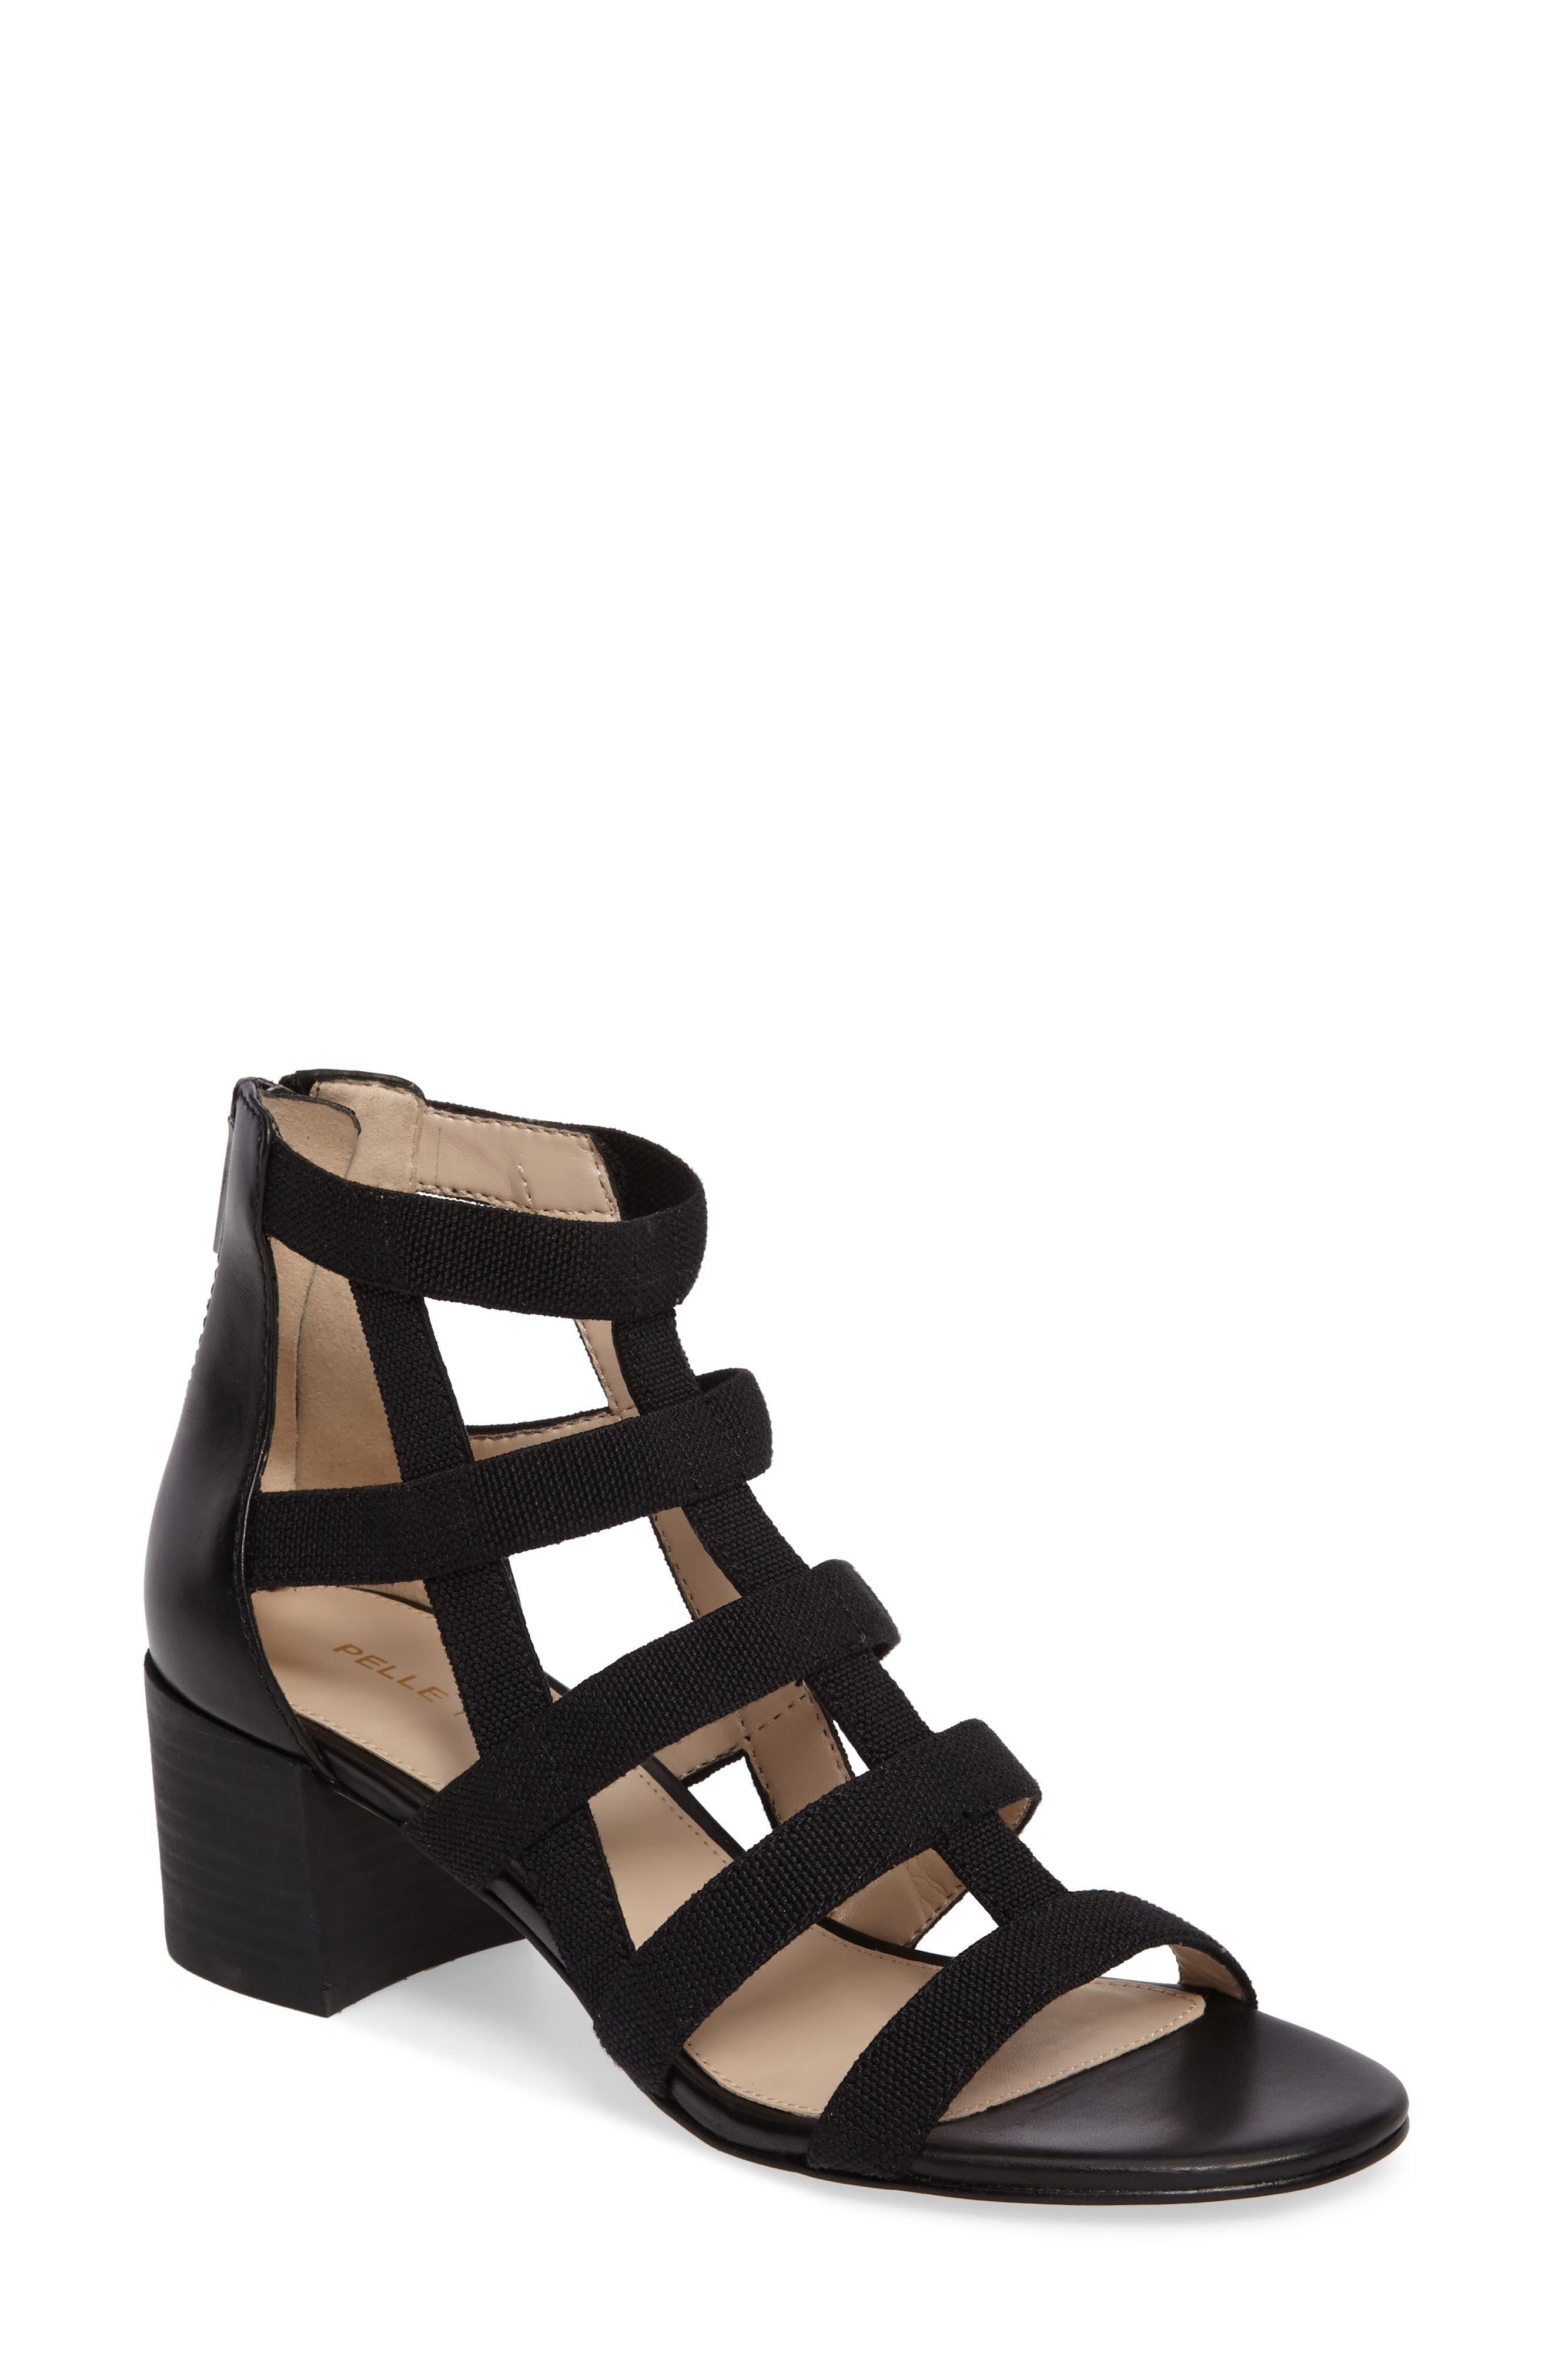 Unkar Block Heel Sandal,                             Main thumbnail 1, color,                             001